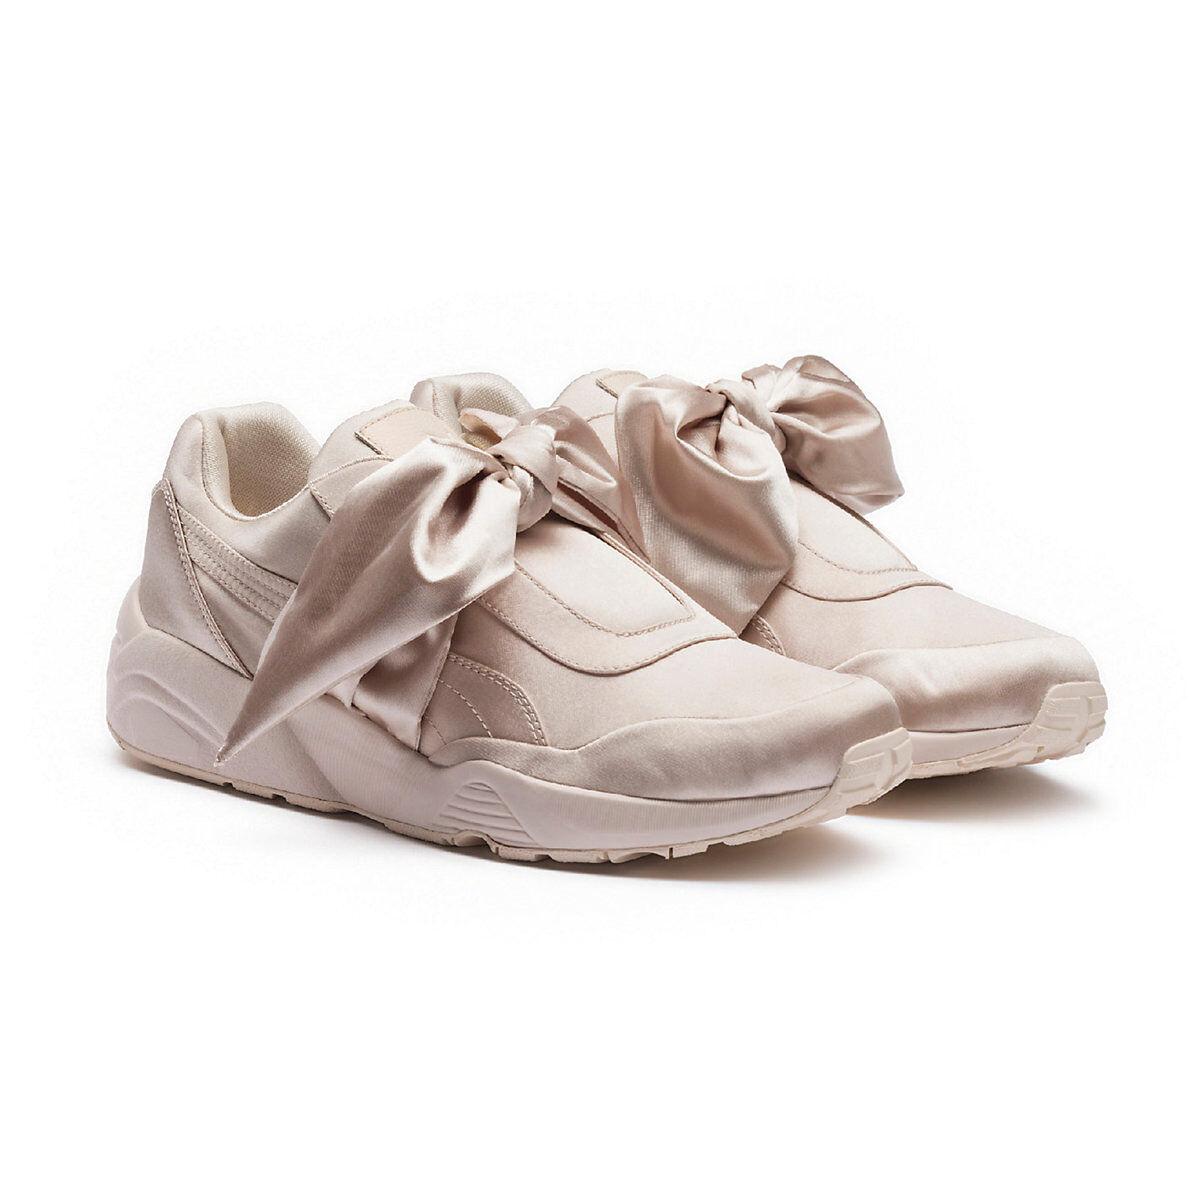 Puma x fenty arco scarpe rosa tinta rhianna formatori - spese postali